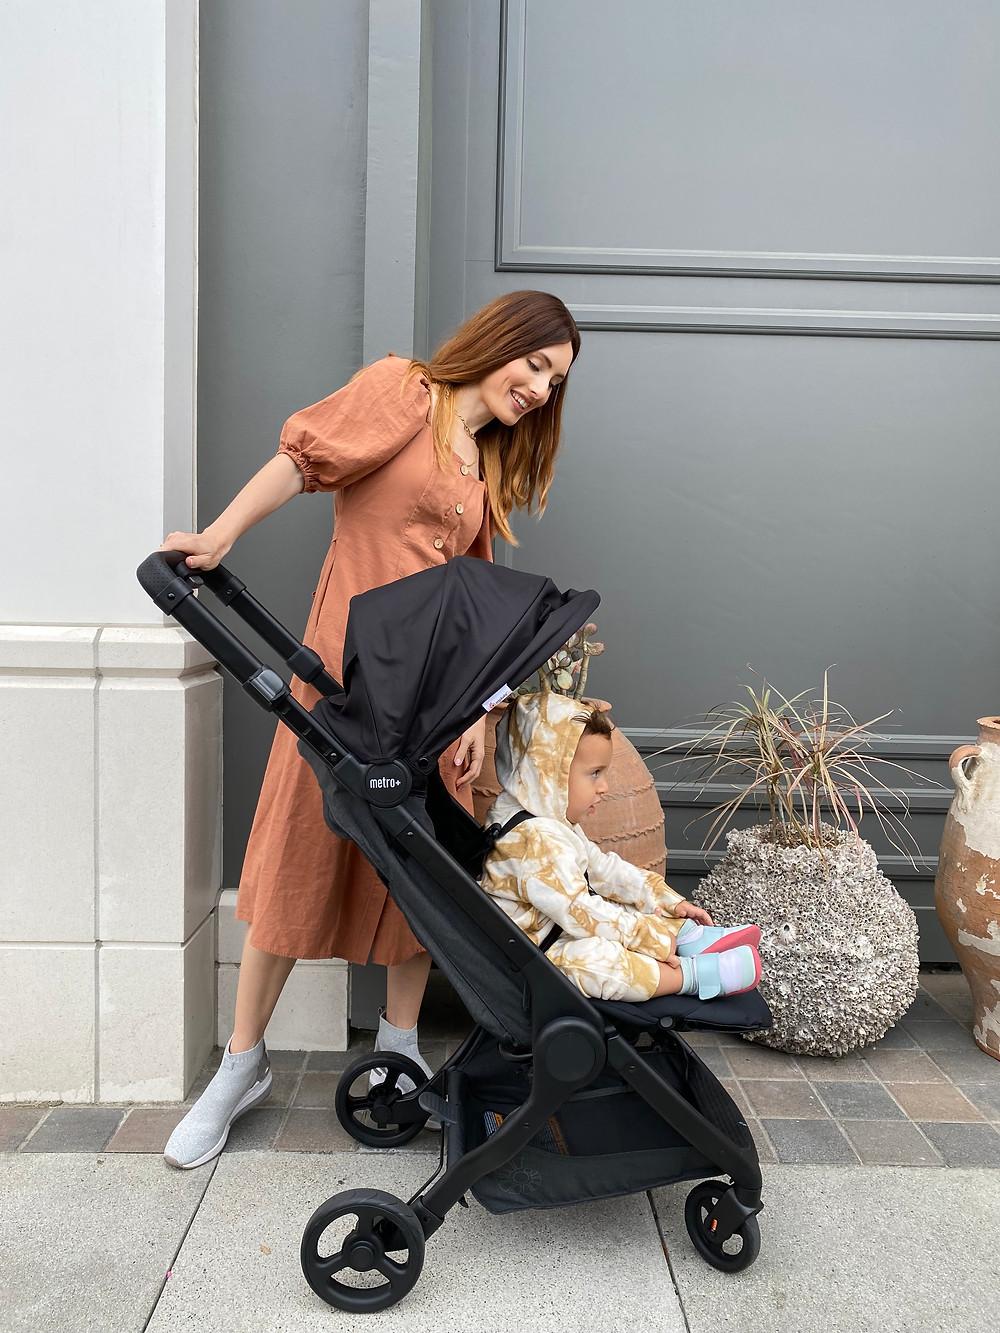 Lightweight compact Ergobaby travel stroller